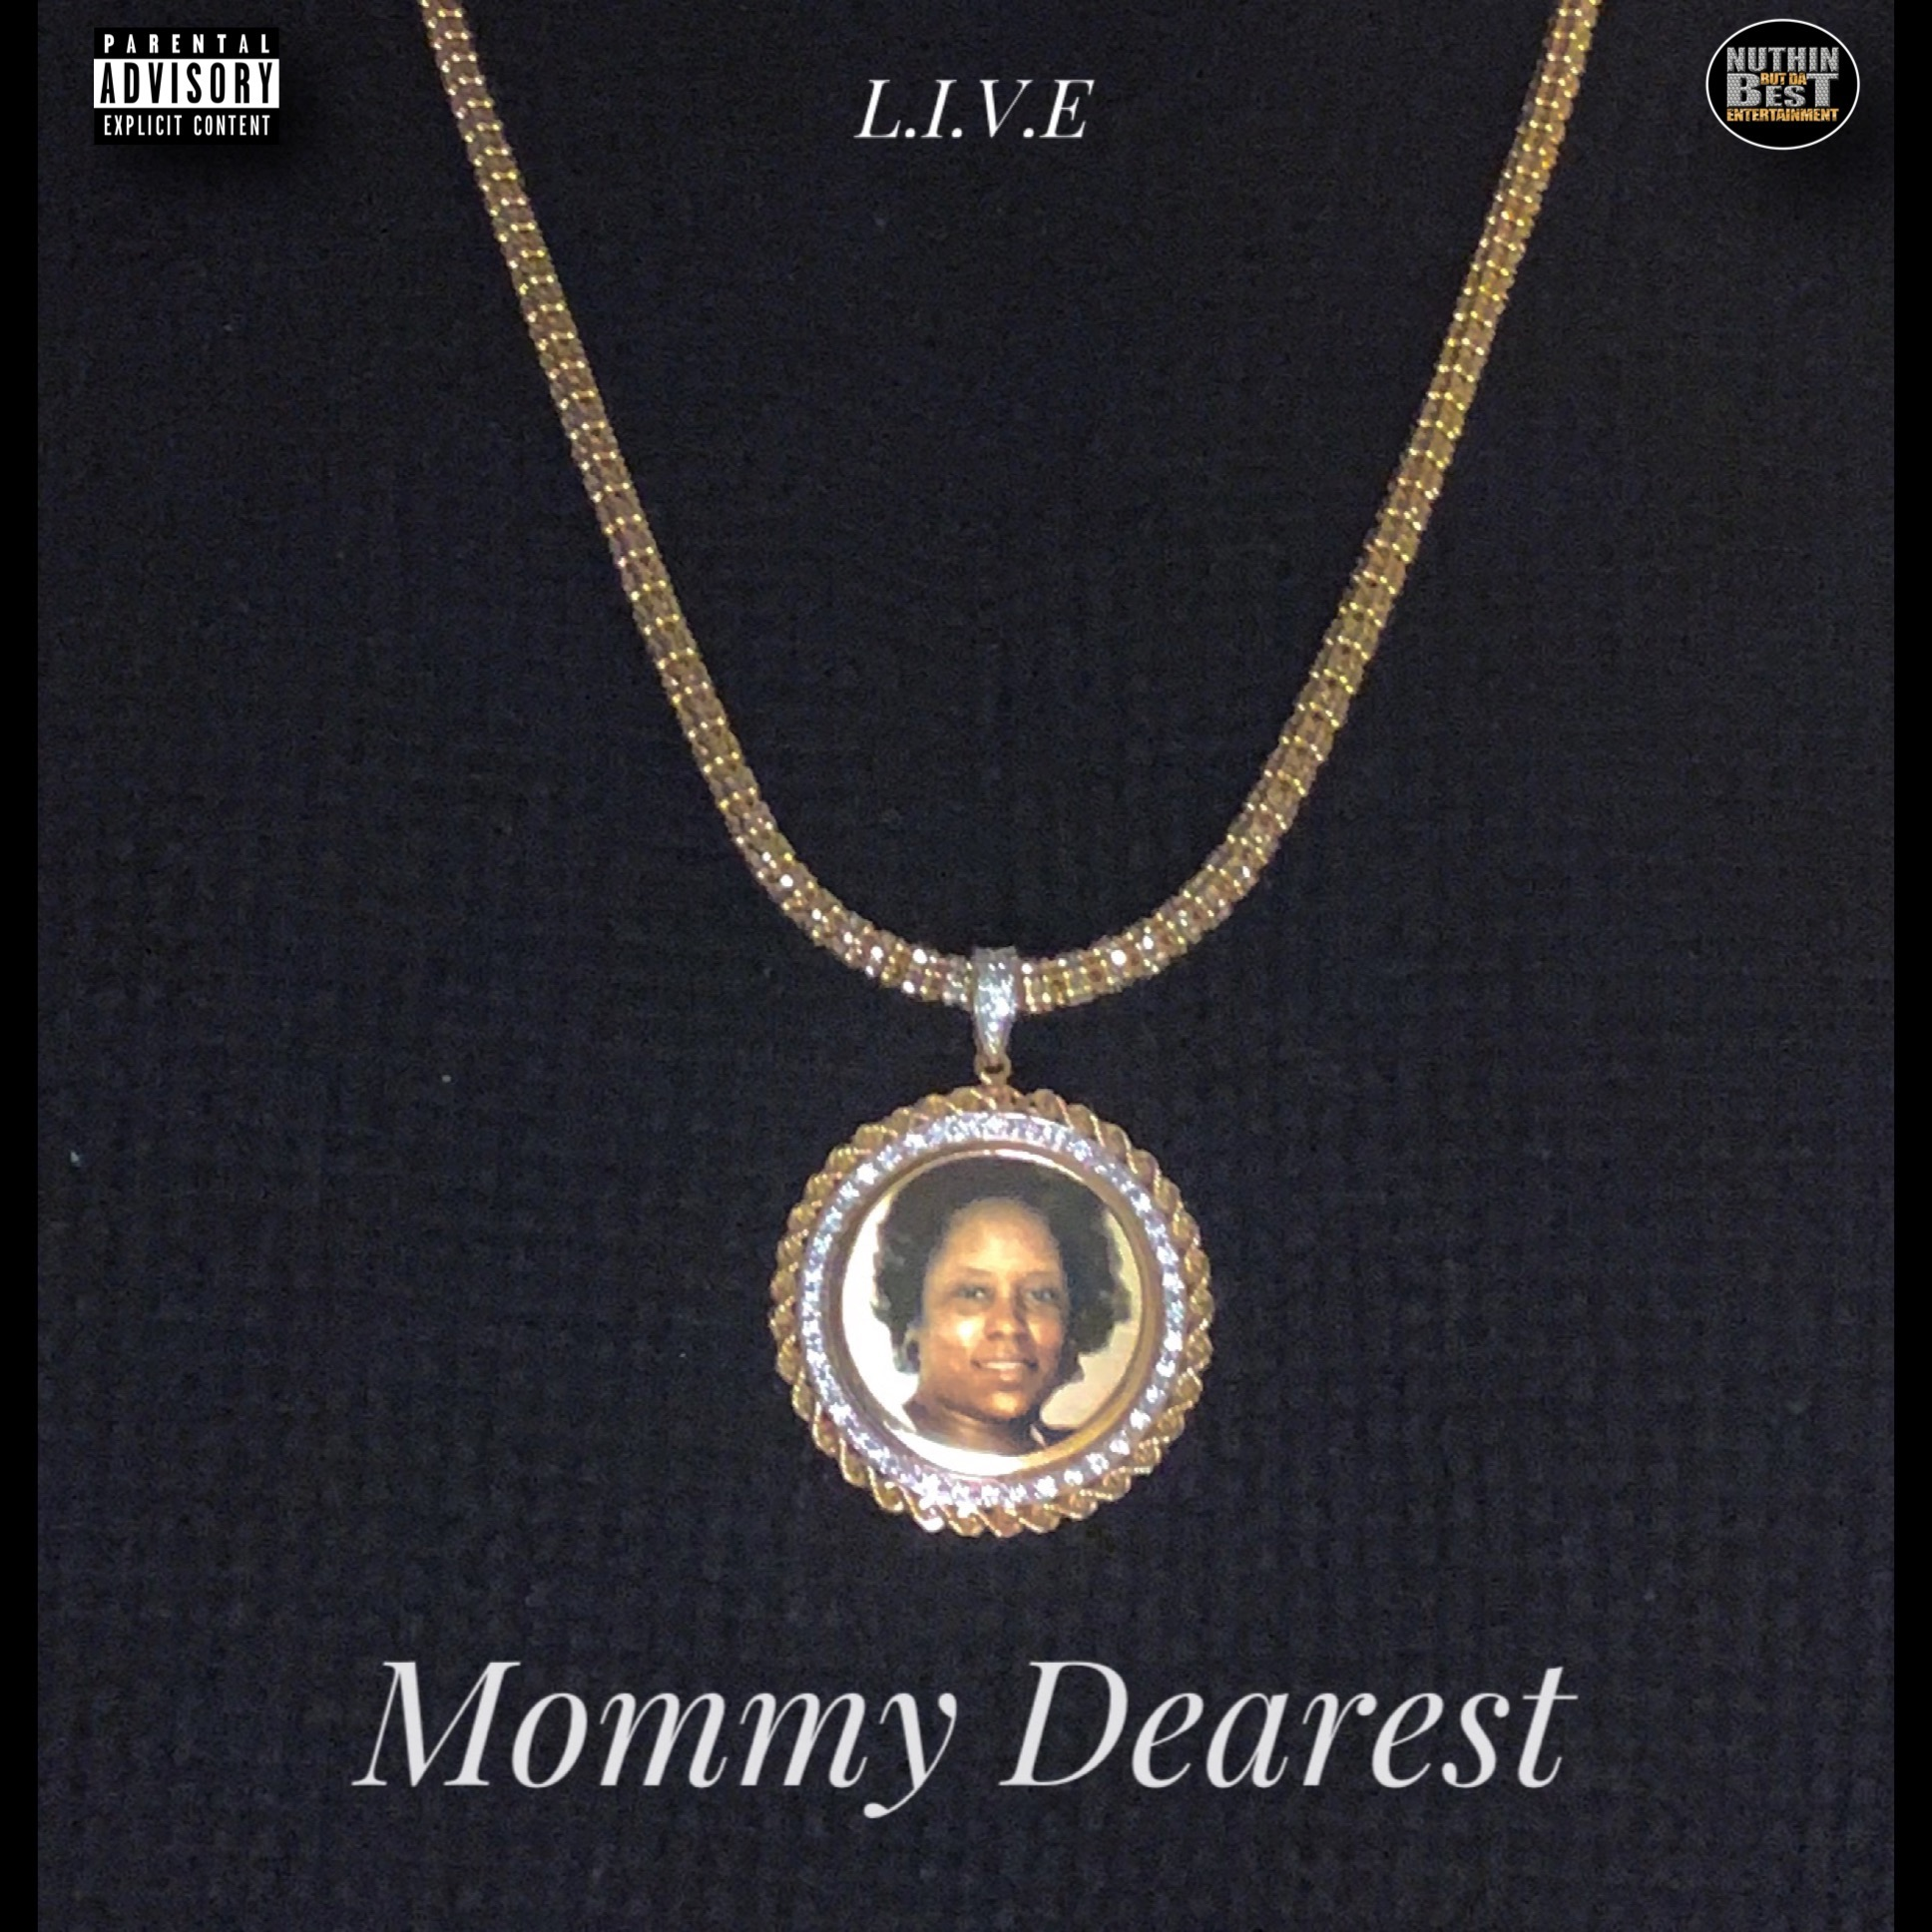 Mommy Dearest (Download or Stream)